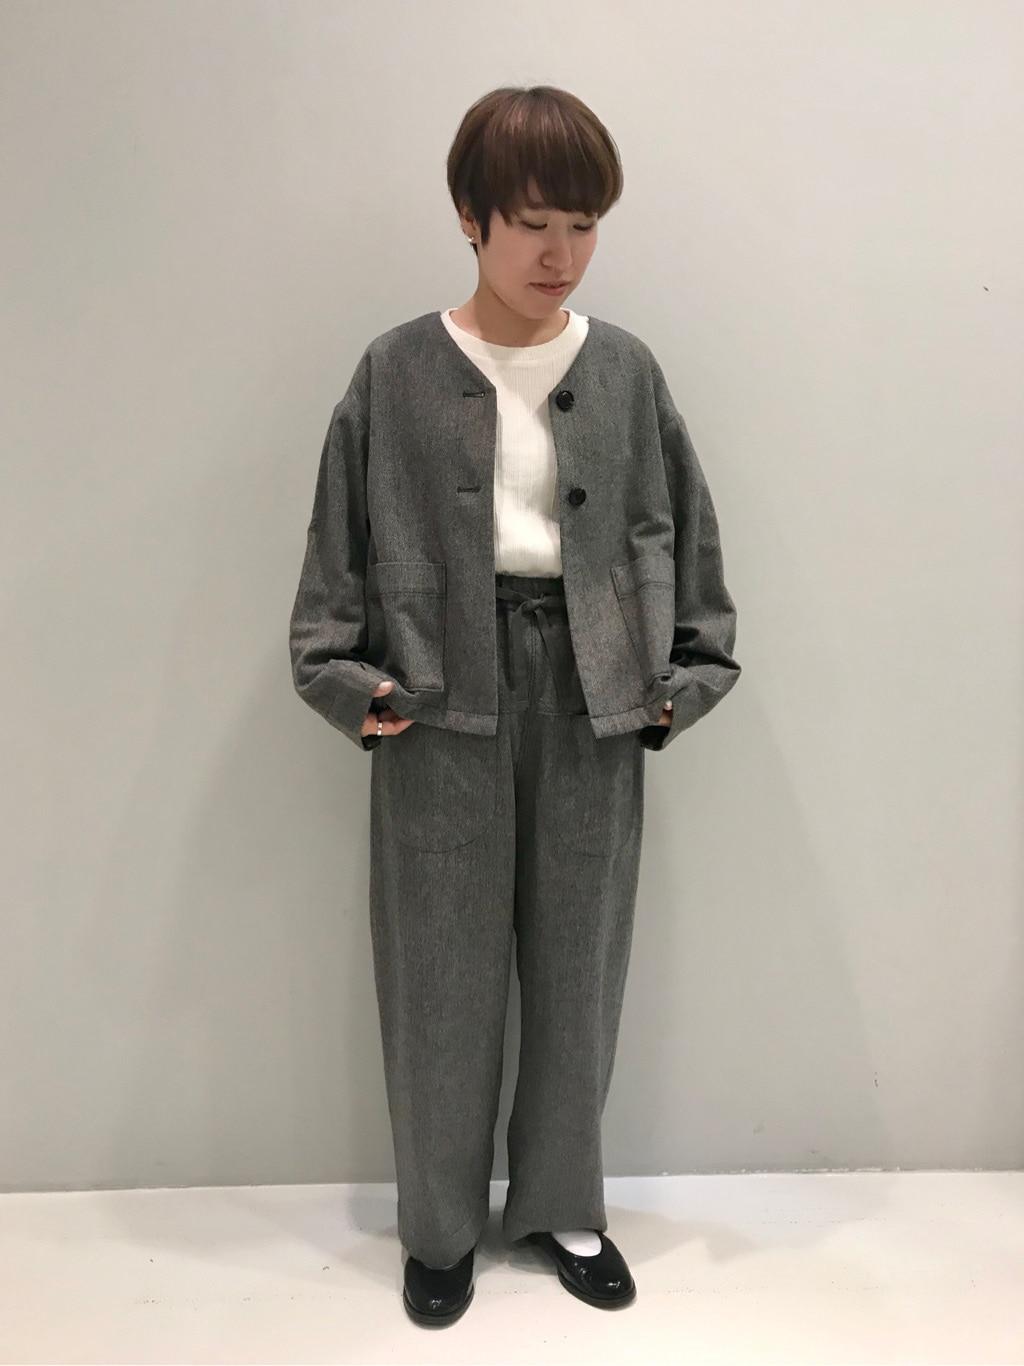 bulle de savon なんばシティ 身長:148cm 2020.10.13